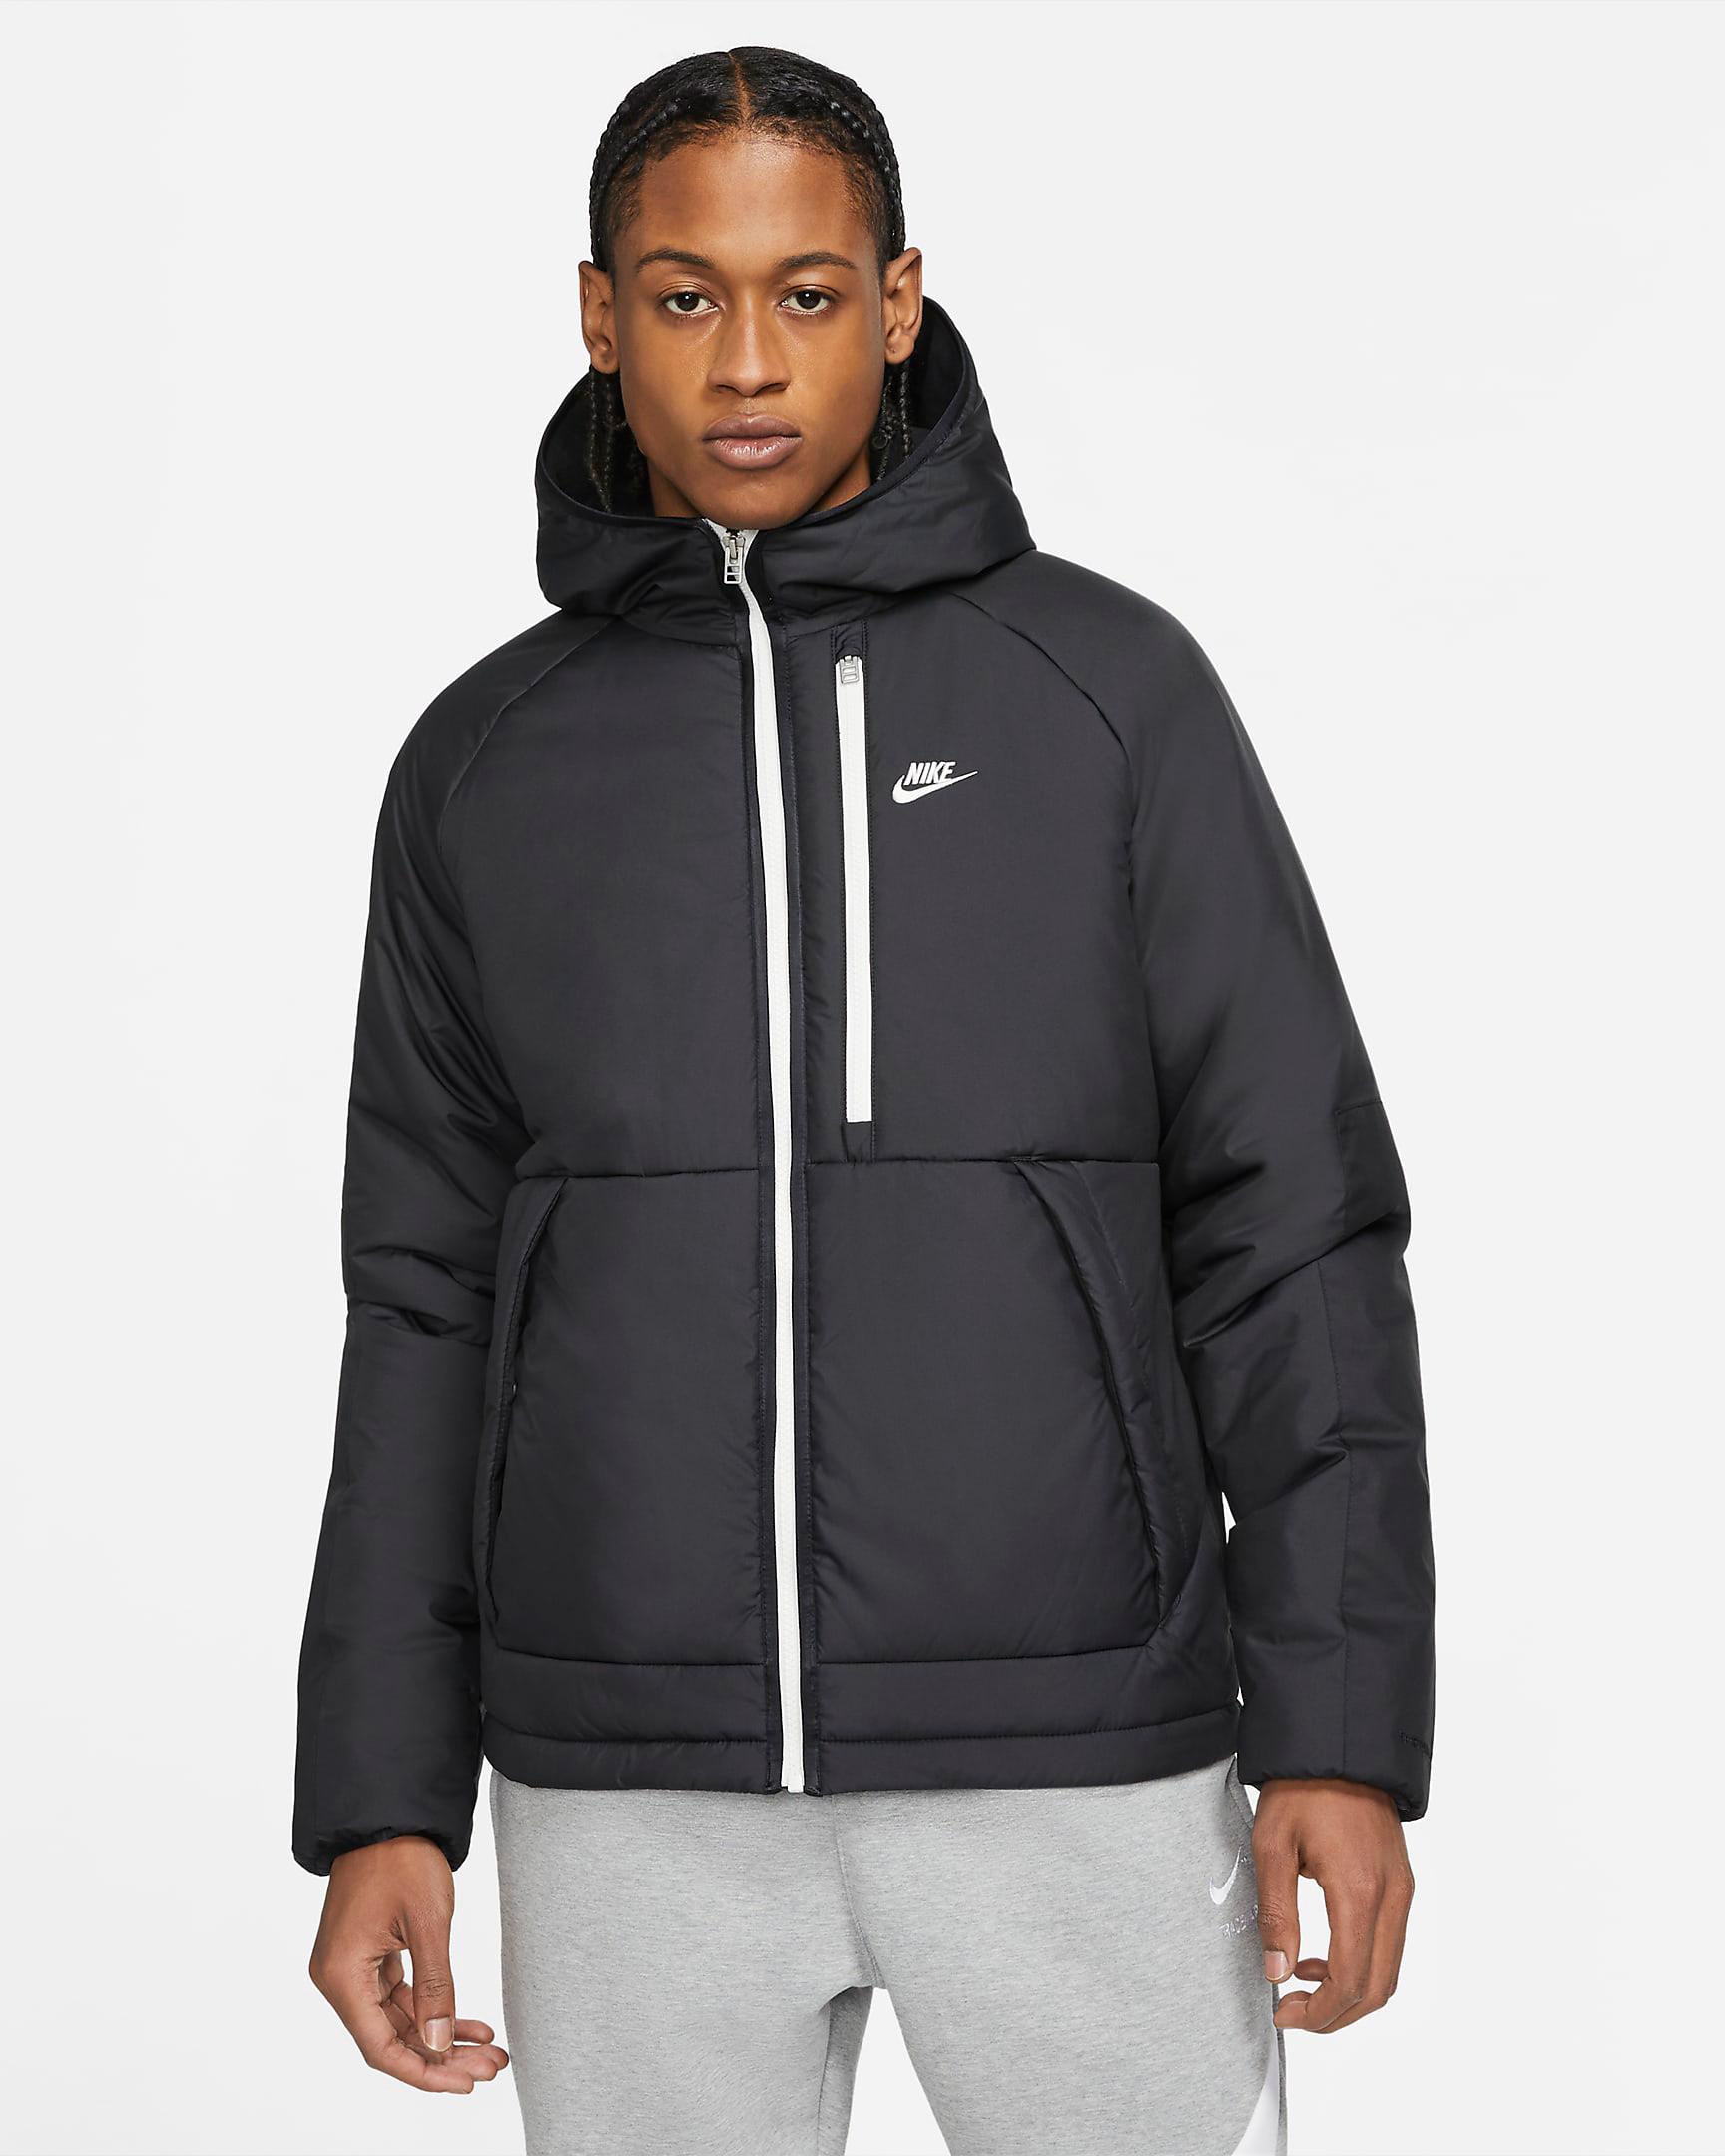 nike-sportswear-therma-fit-legacy-hooded-jacket-black-sail